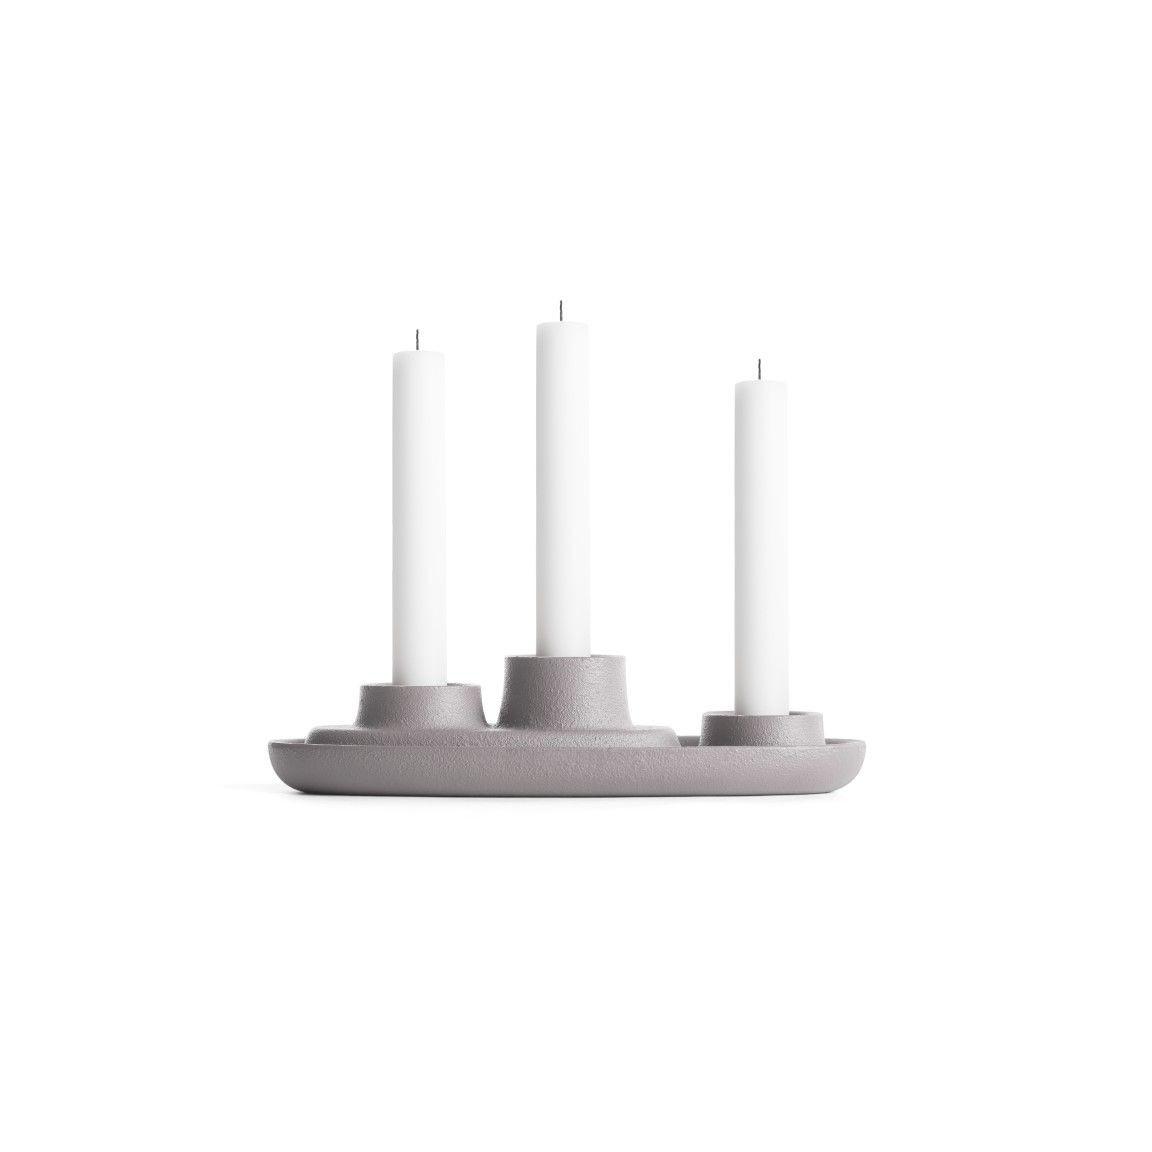 Kerzenhalter für 3 Kerzen | Grau